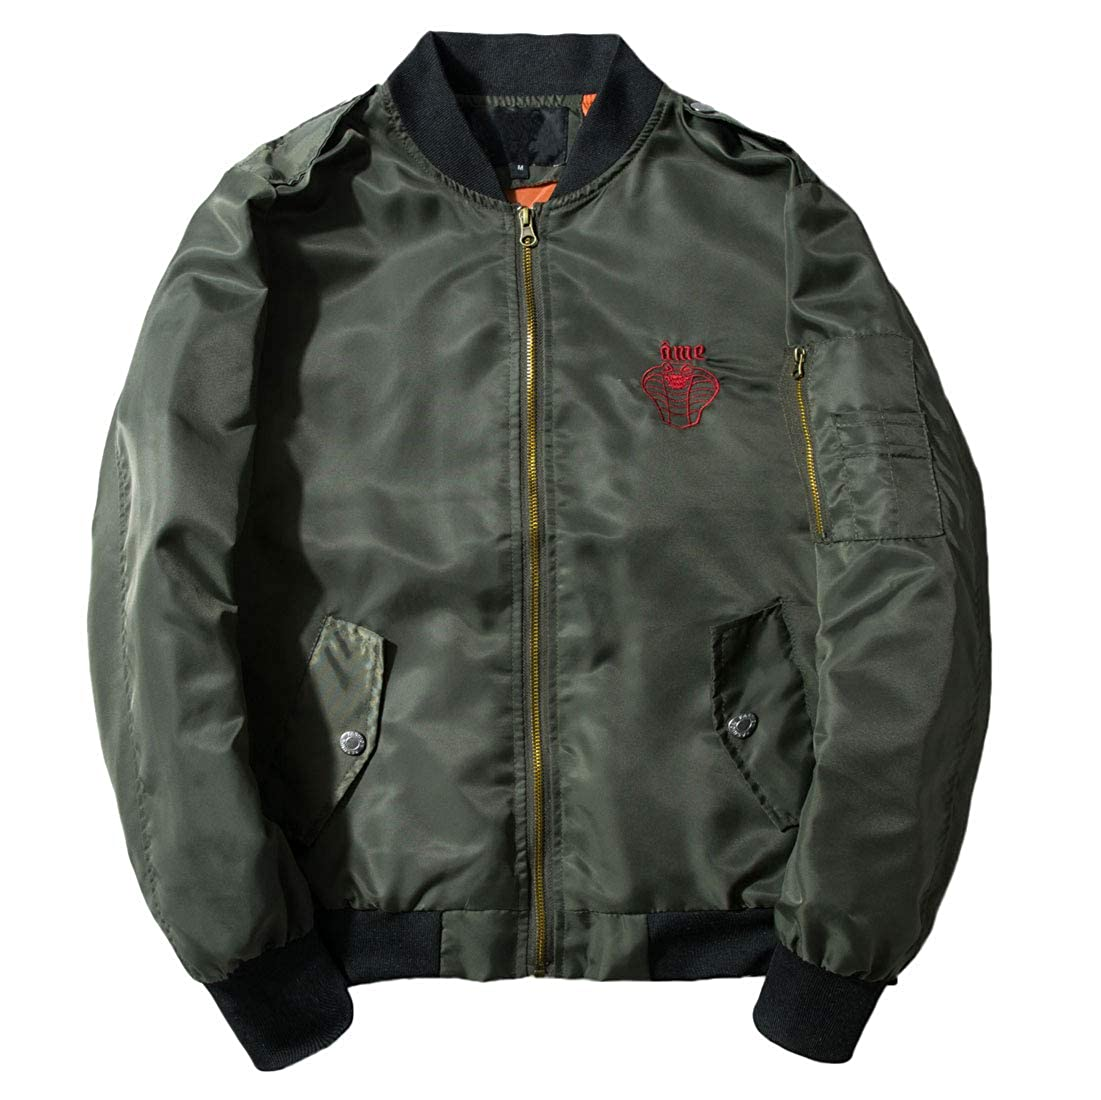 49a8cf068 Chartou Men's Classic Snake-Embroidery Lightweight Flight Baseball Jacket  Windbreaker